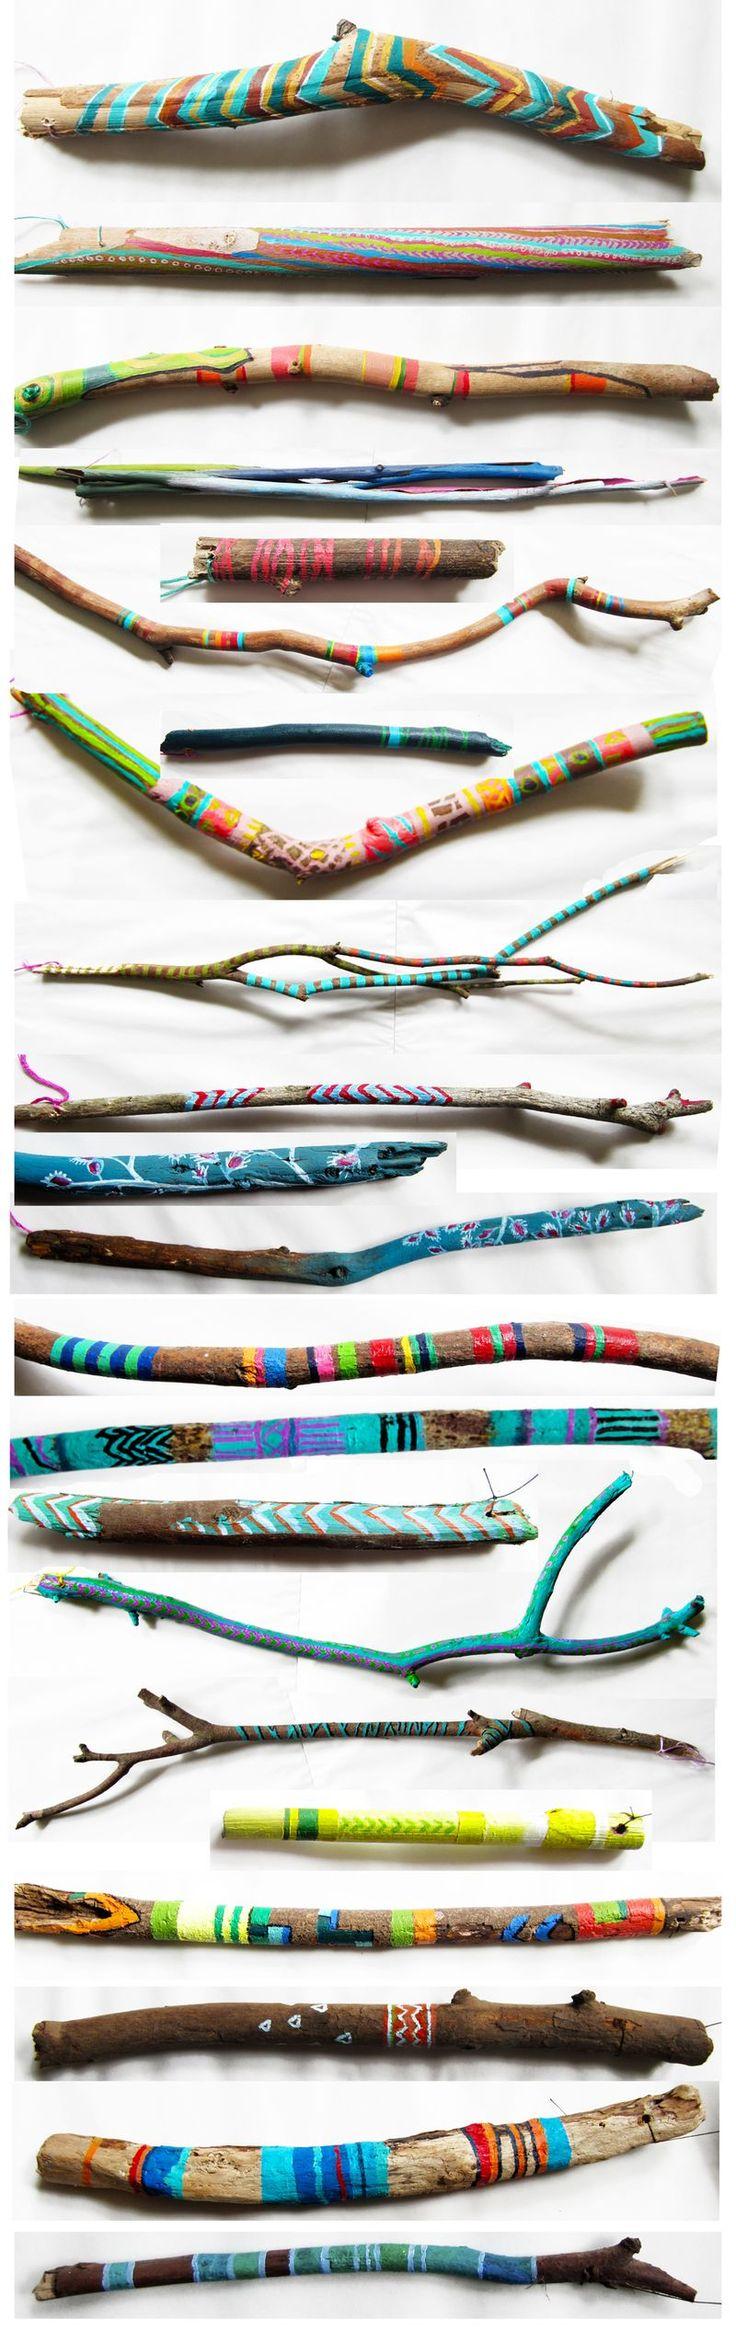 Painted sticks.